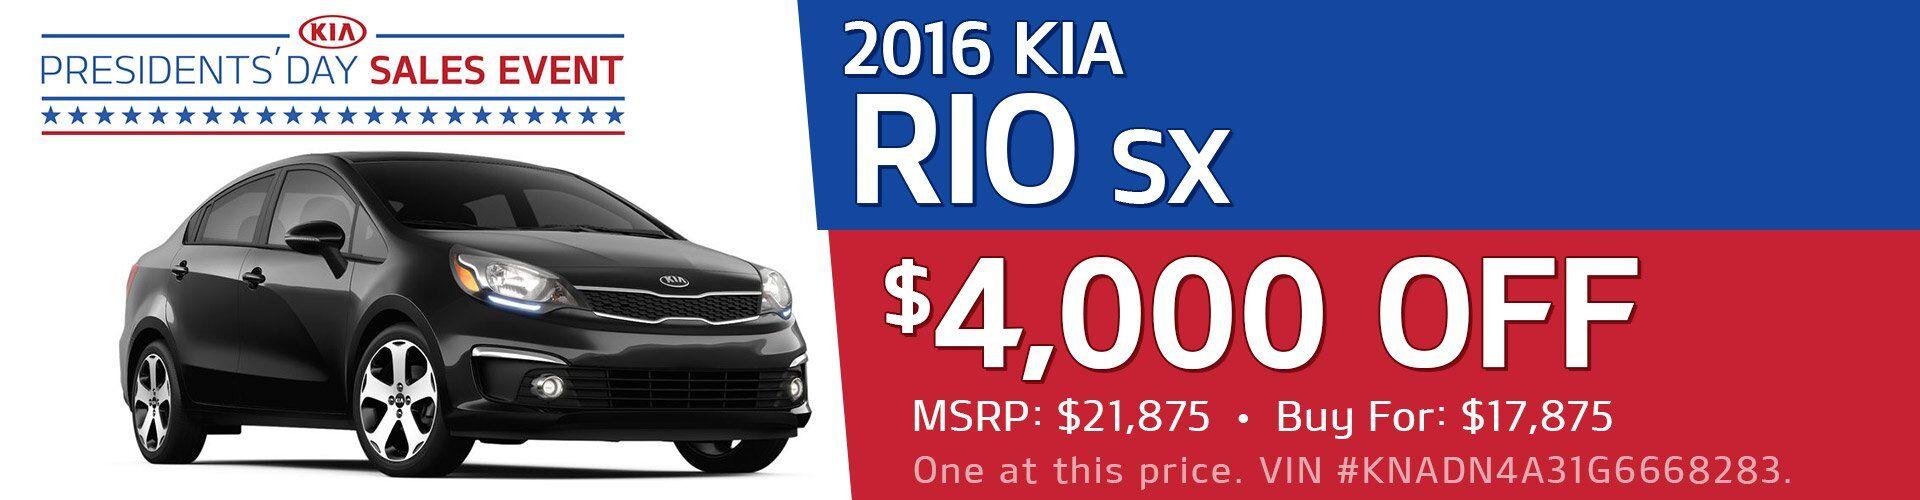 2016 Kia Rio SX